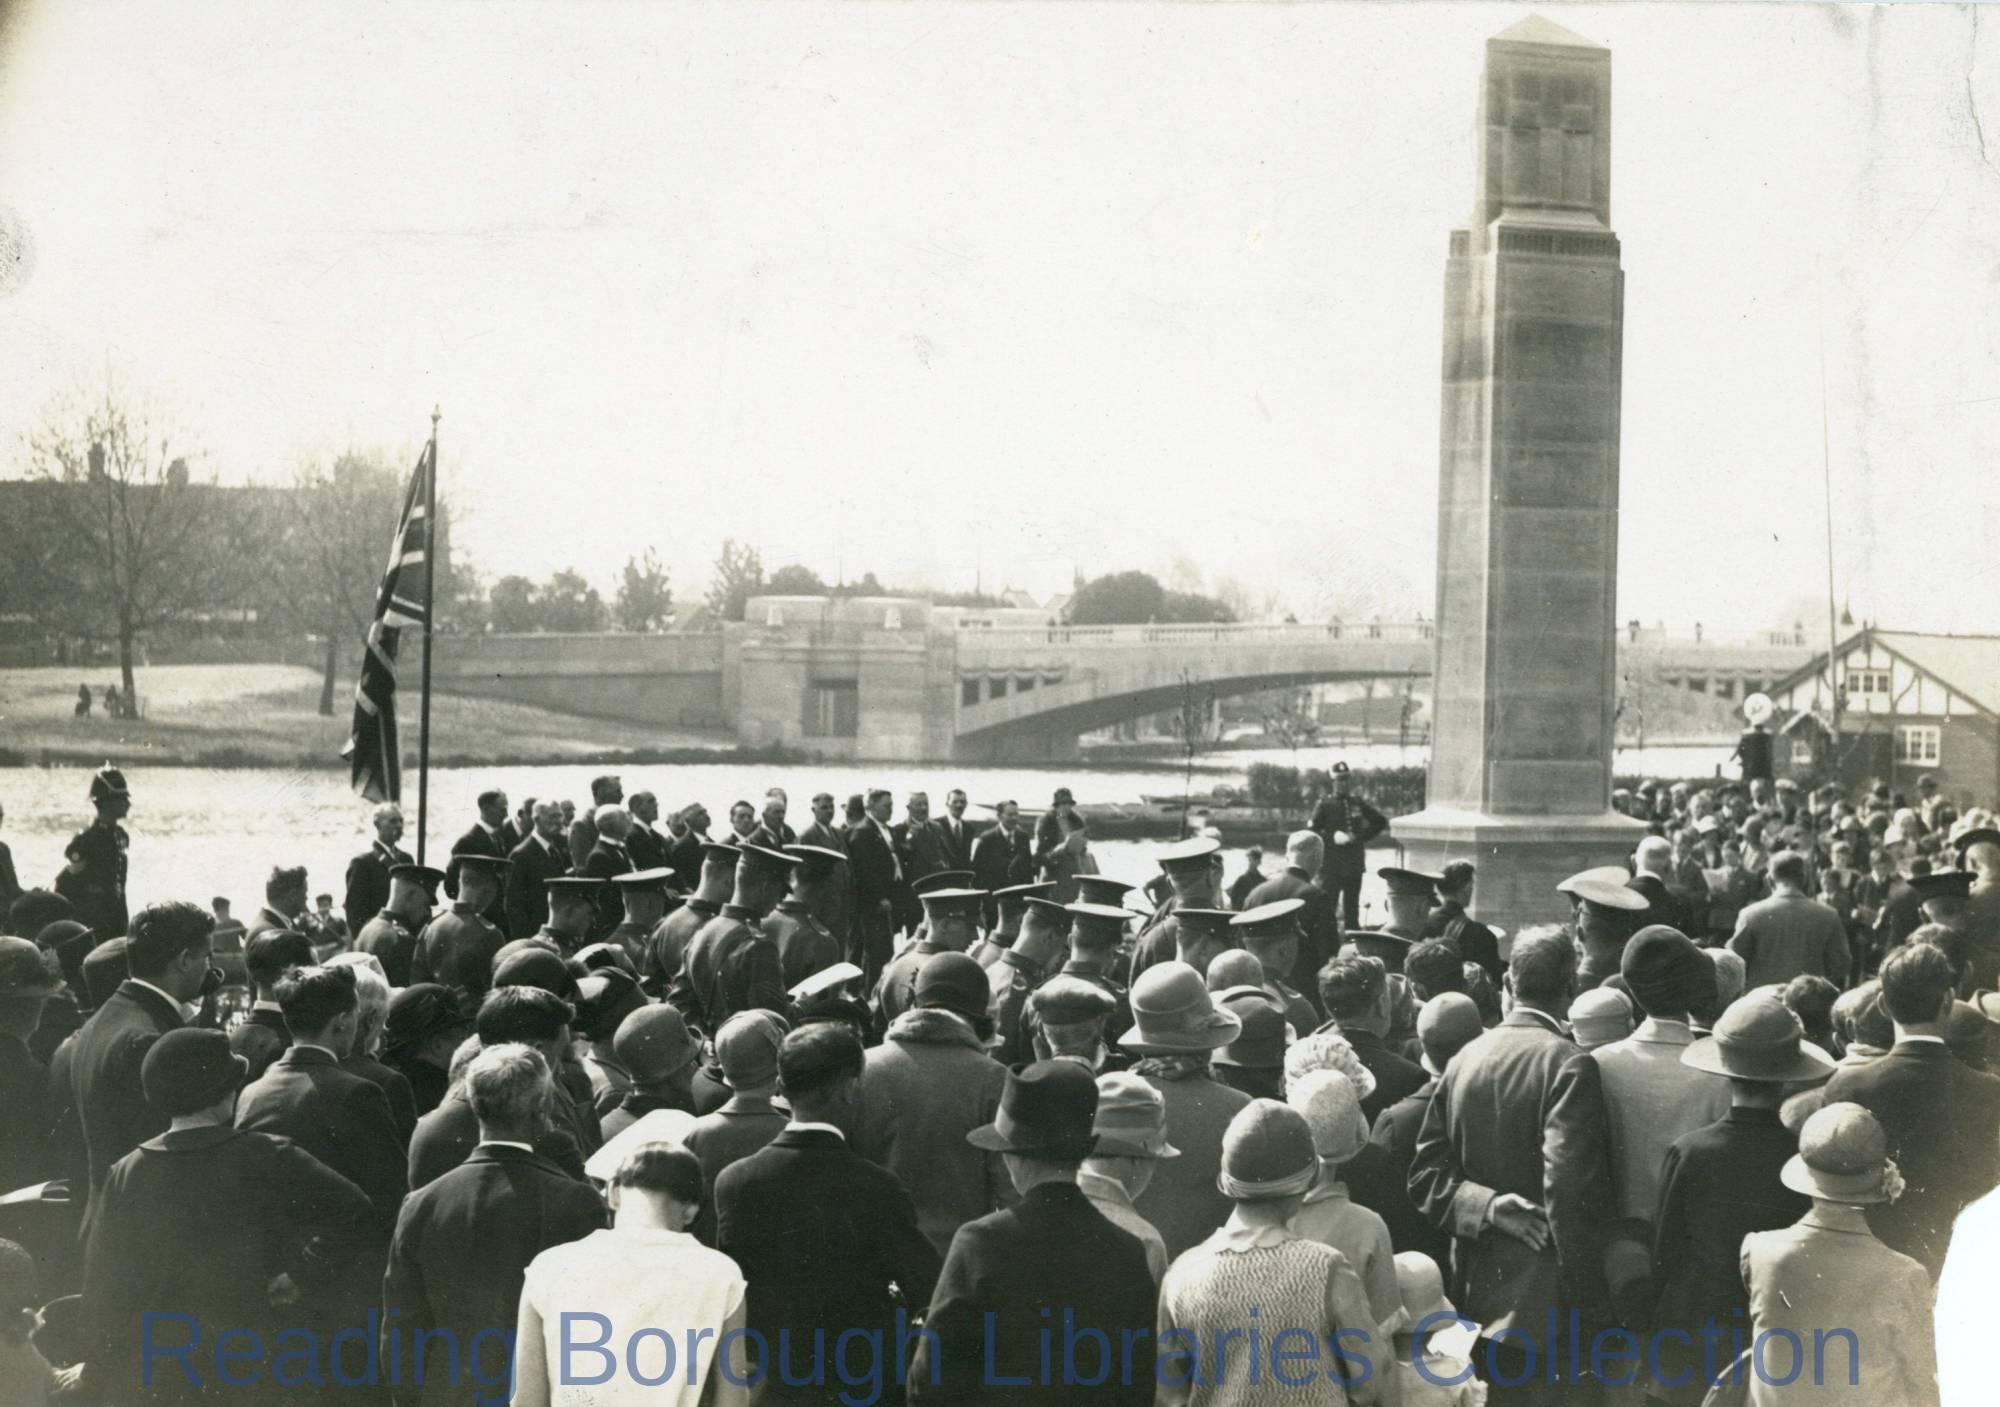 The unveiling of Caversham War Memorial in Christchurch Meadows, 5 May 1928.